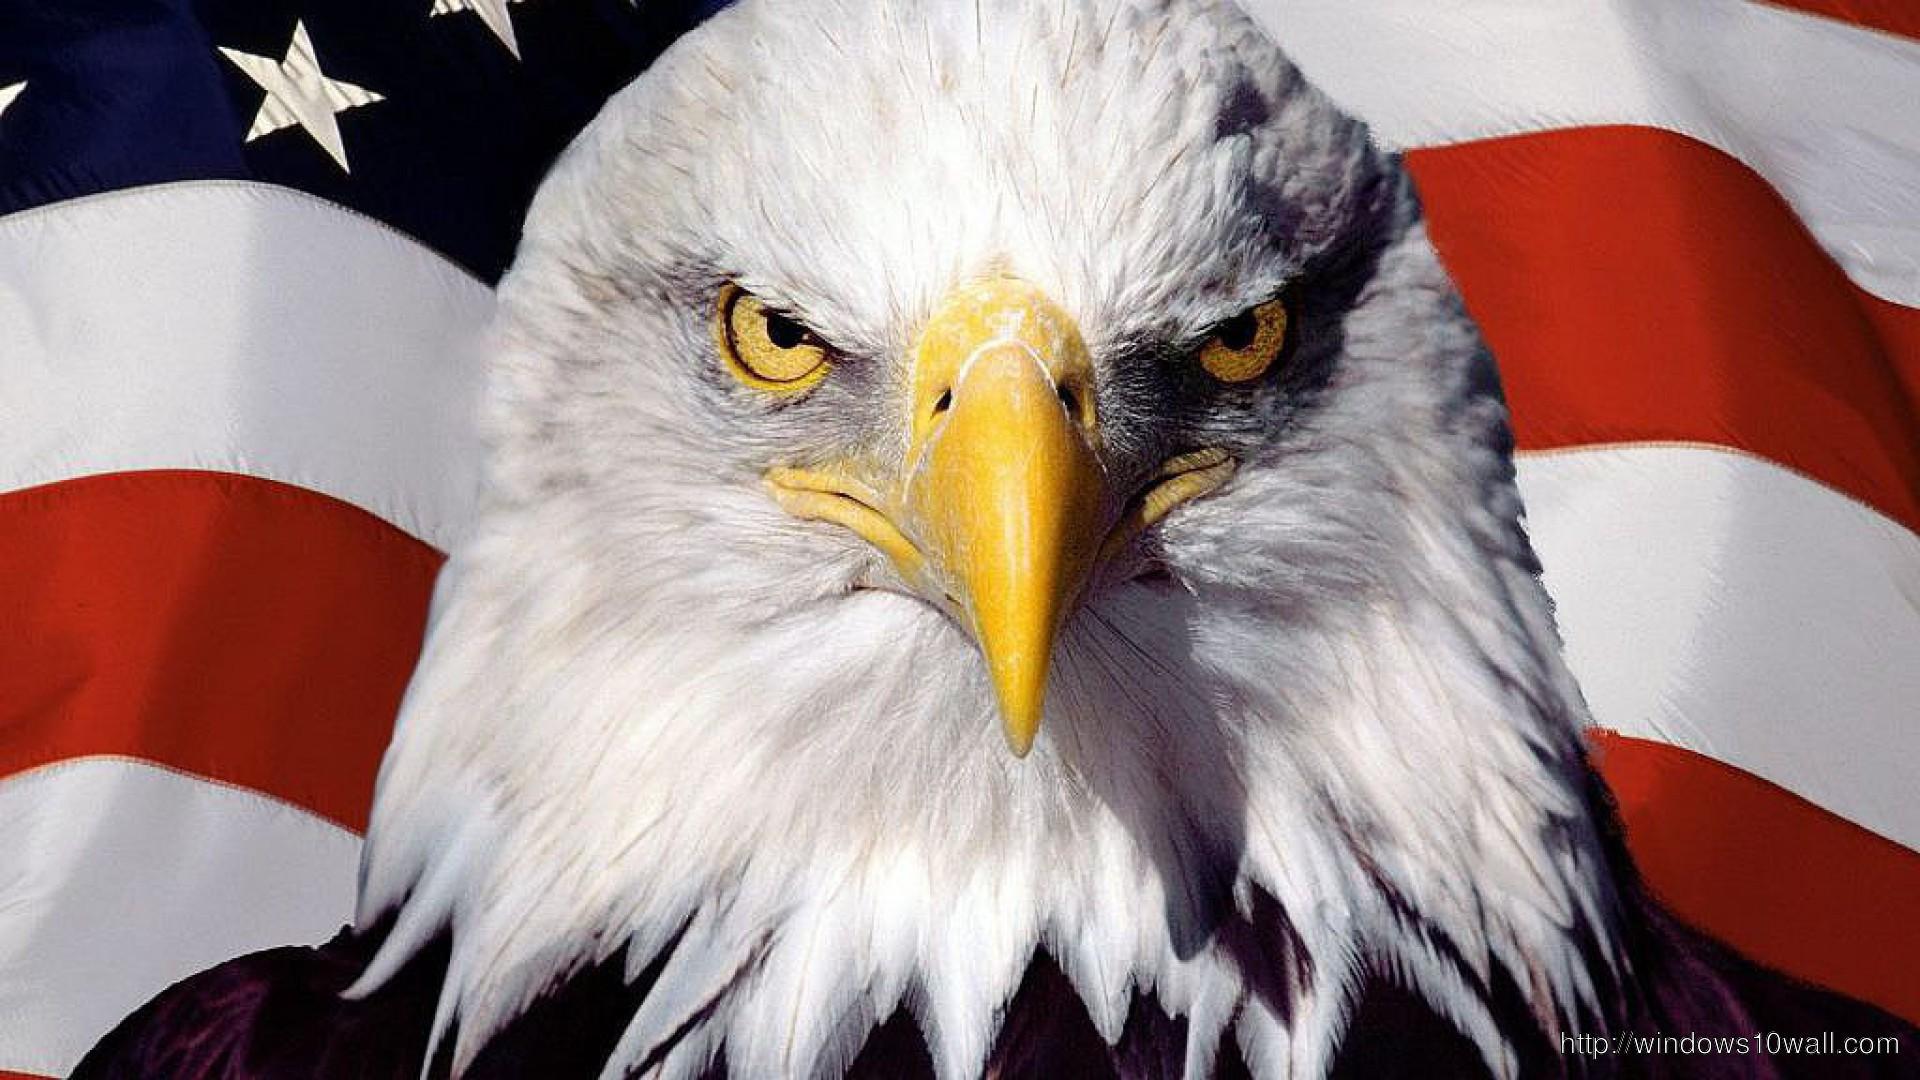 eagle-bird-on-flag-wallpaper